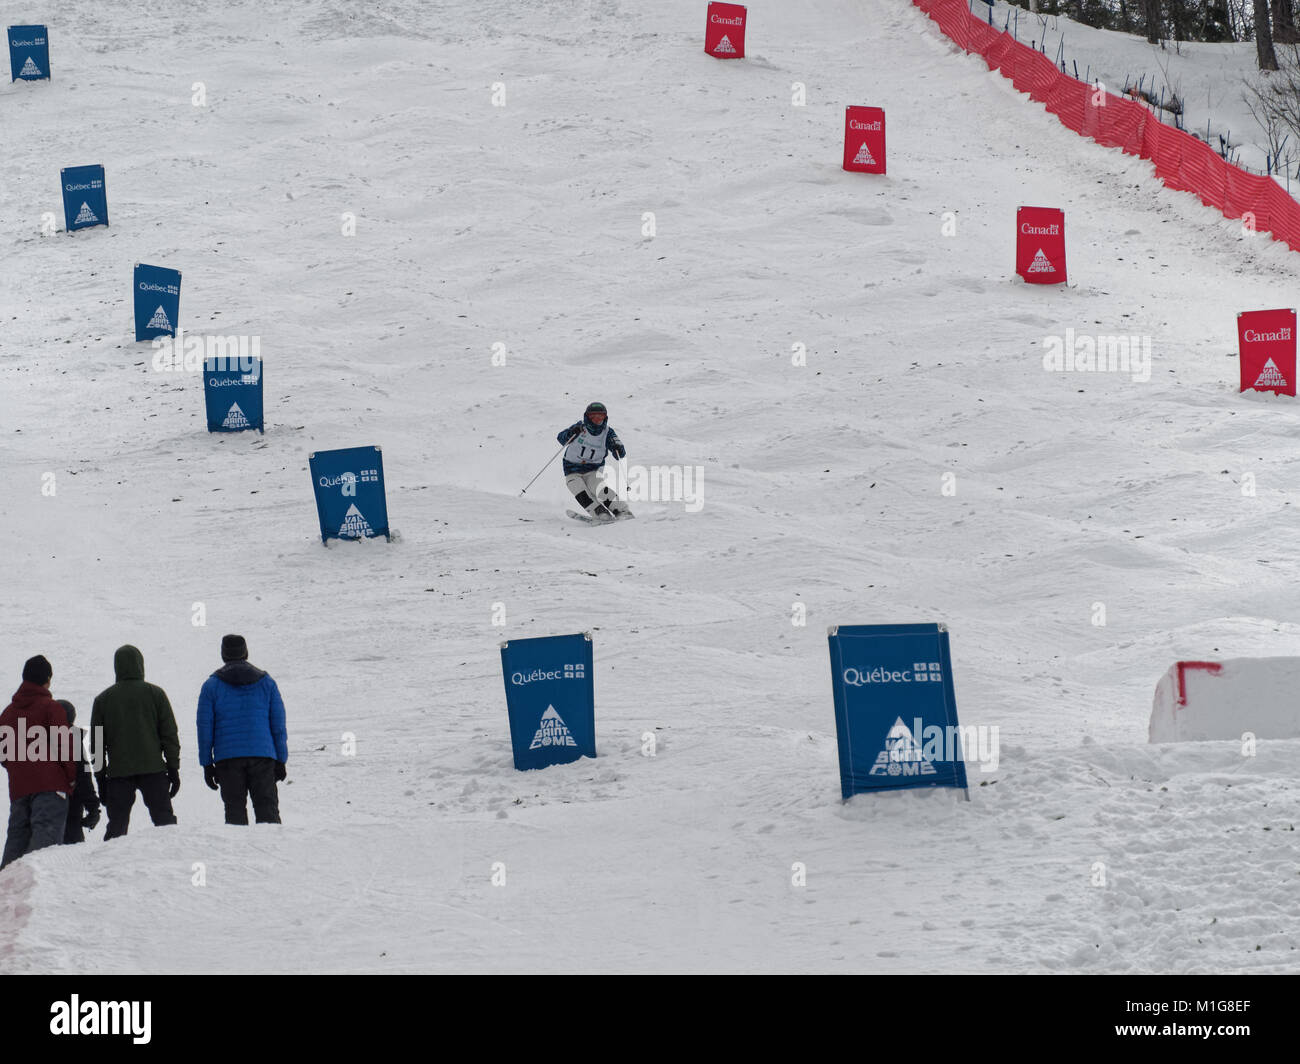 Val Saint-Come,Canada 1/27/2018. Kosuke Sugimoto of Japan competes at the 2018 NorAm Moguls Championship - Stock Image